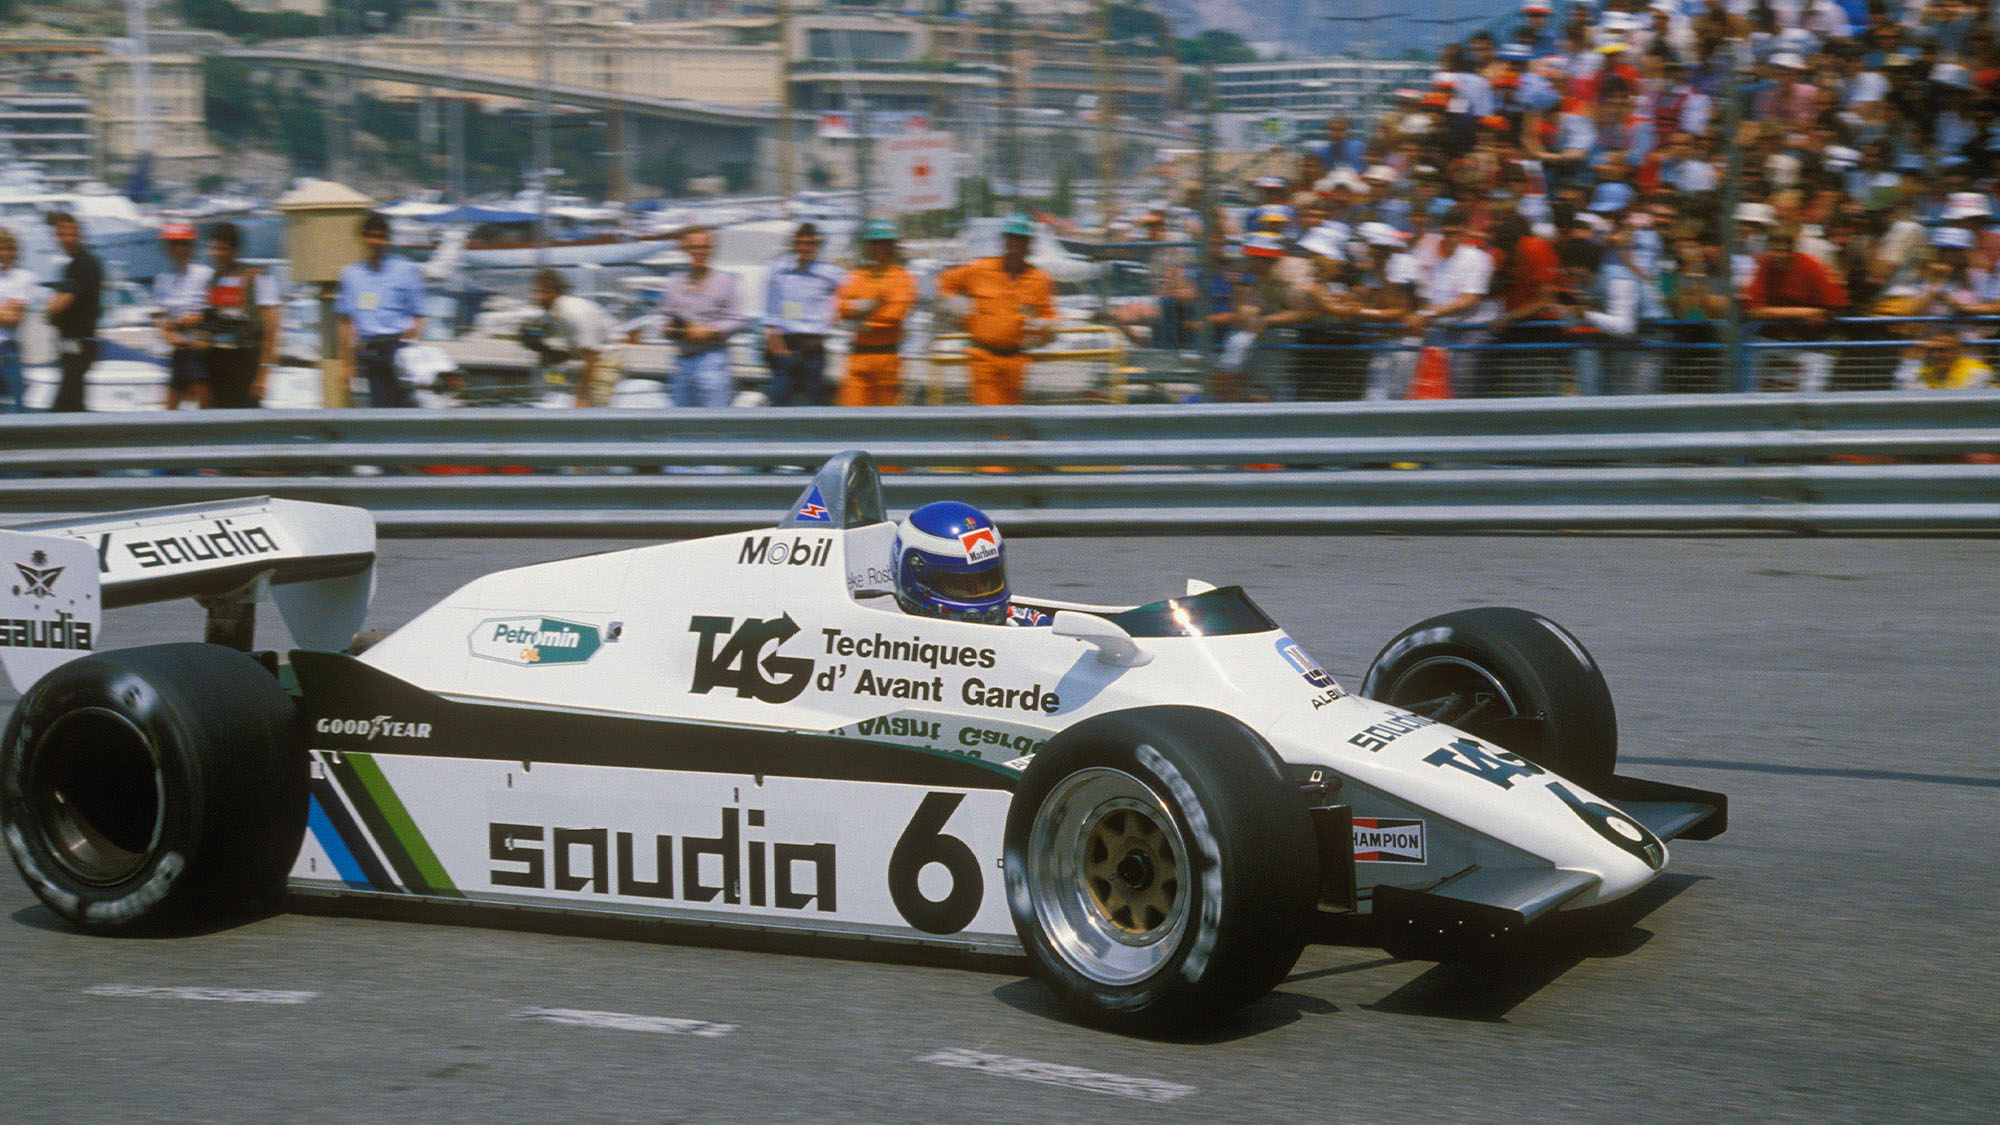 Rosberg Monaco 82